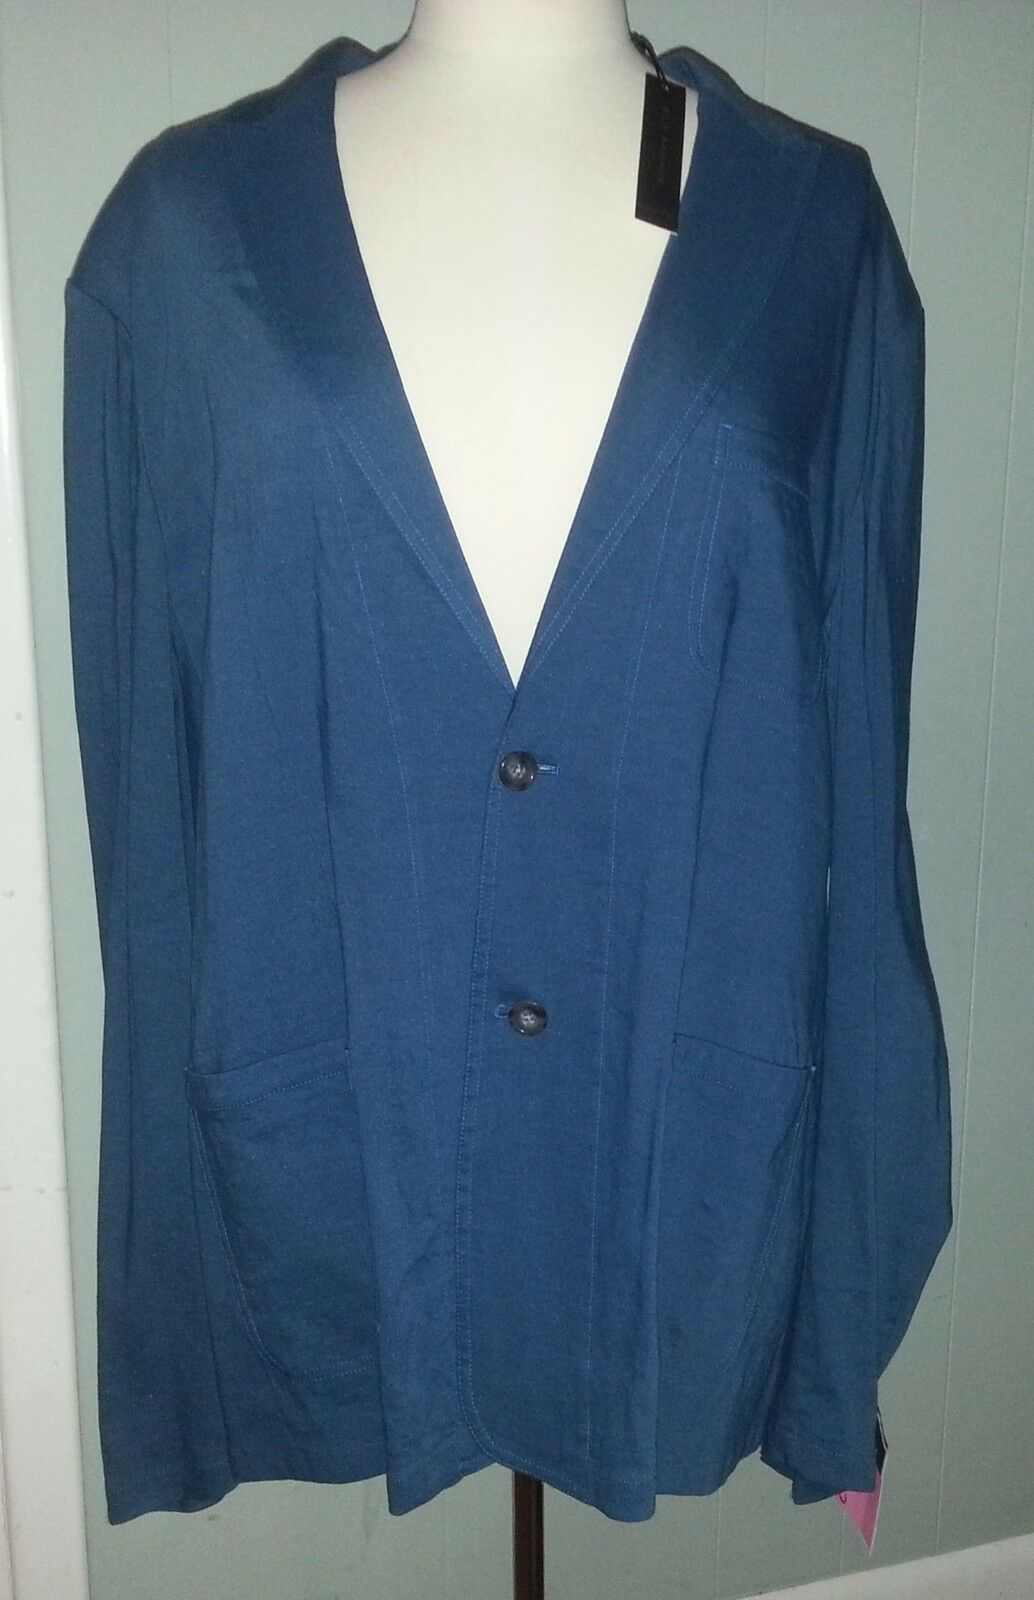 Elie Tahari Sport Coat Miles Outerwear XXL Blau Light Linen Blend 398 NWT h085